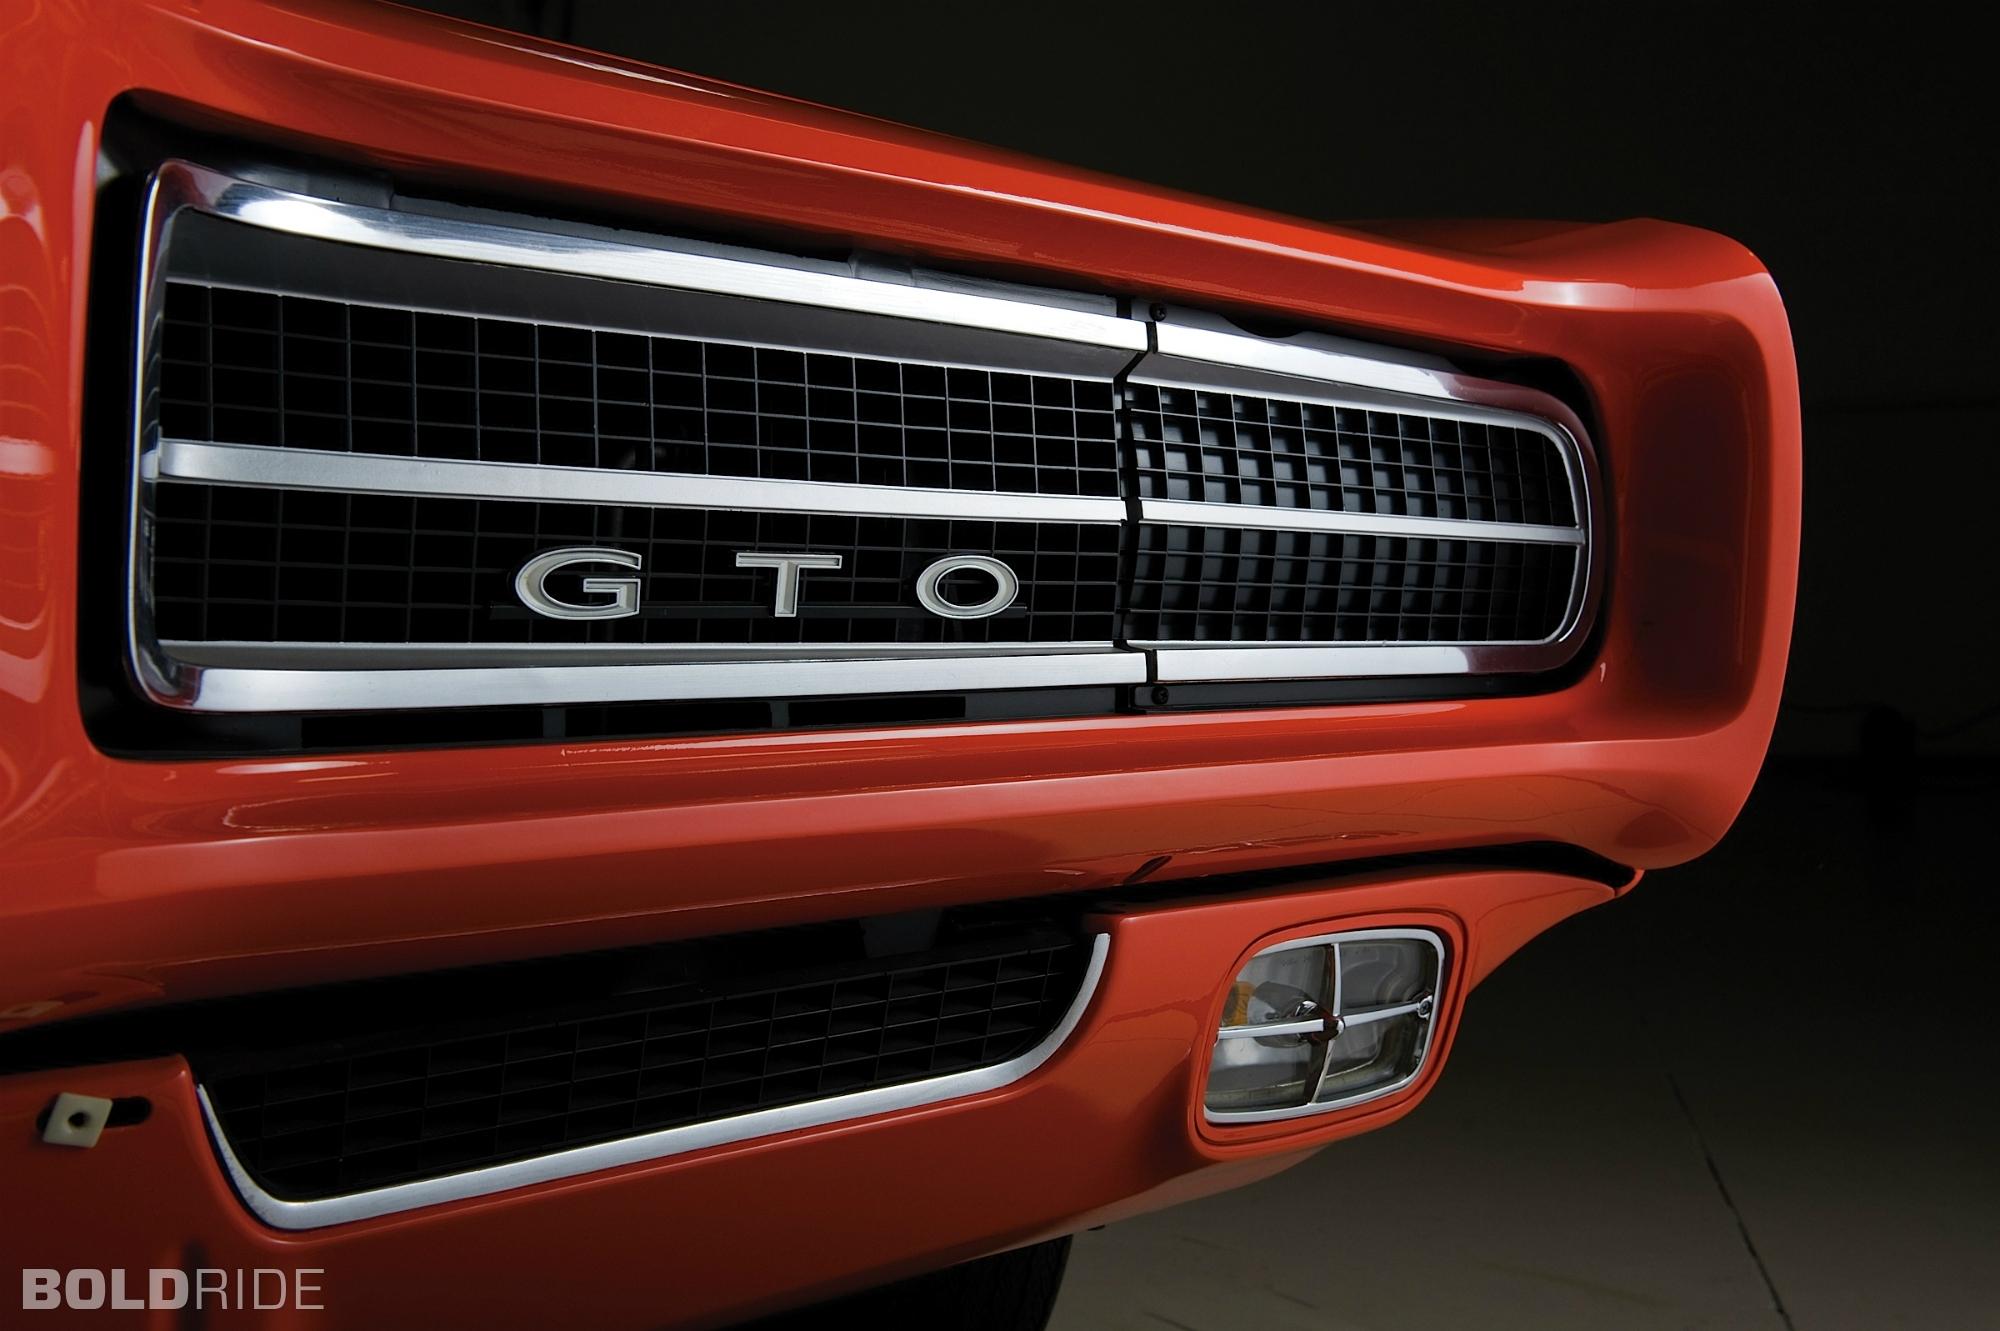 2015 Pontiac Judge Concept Specs Release Date | 2016 Car Release Date